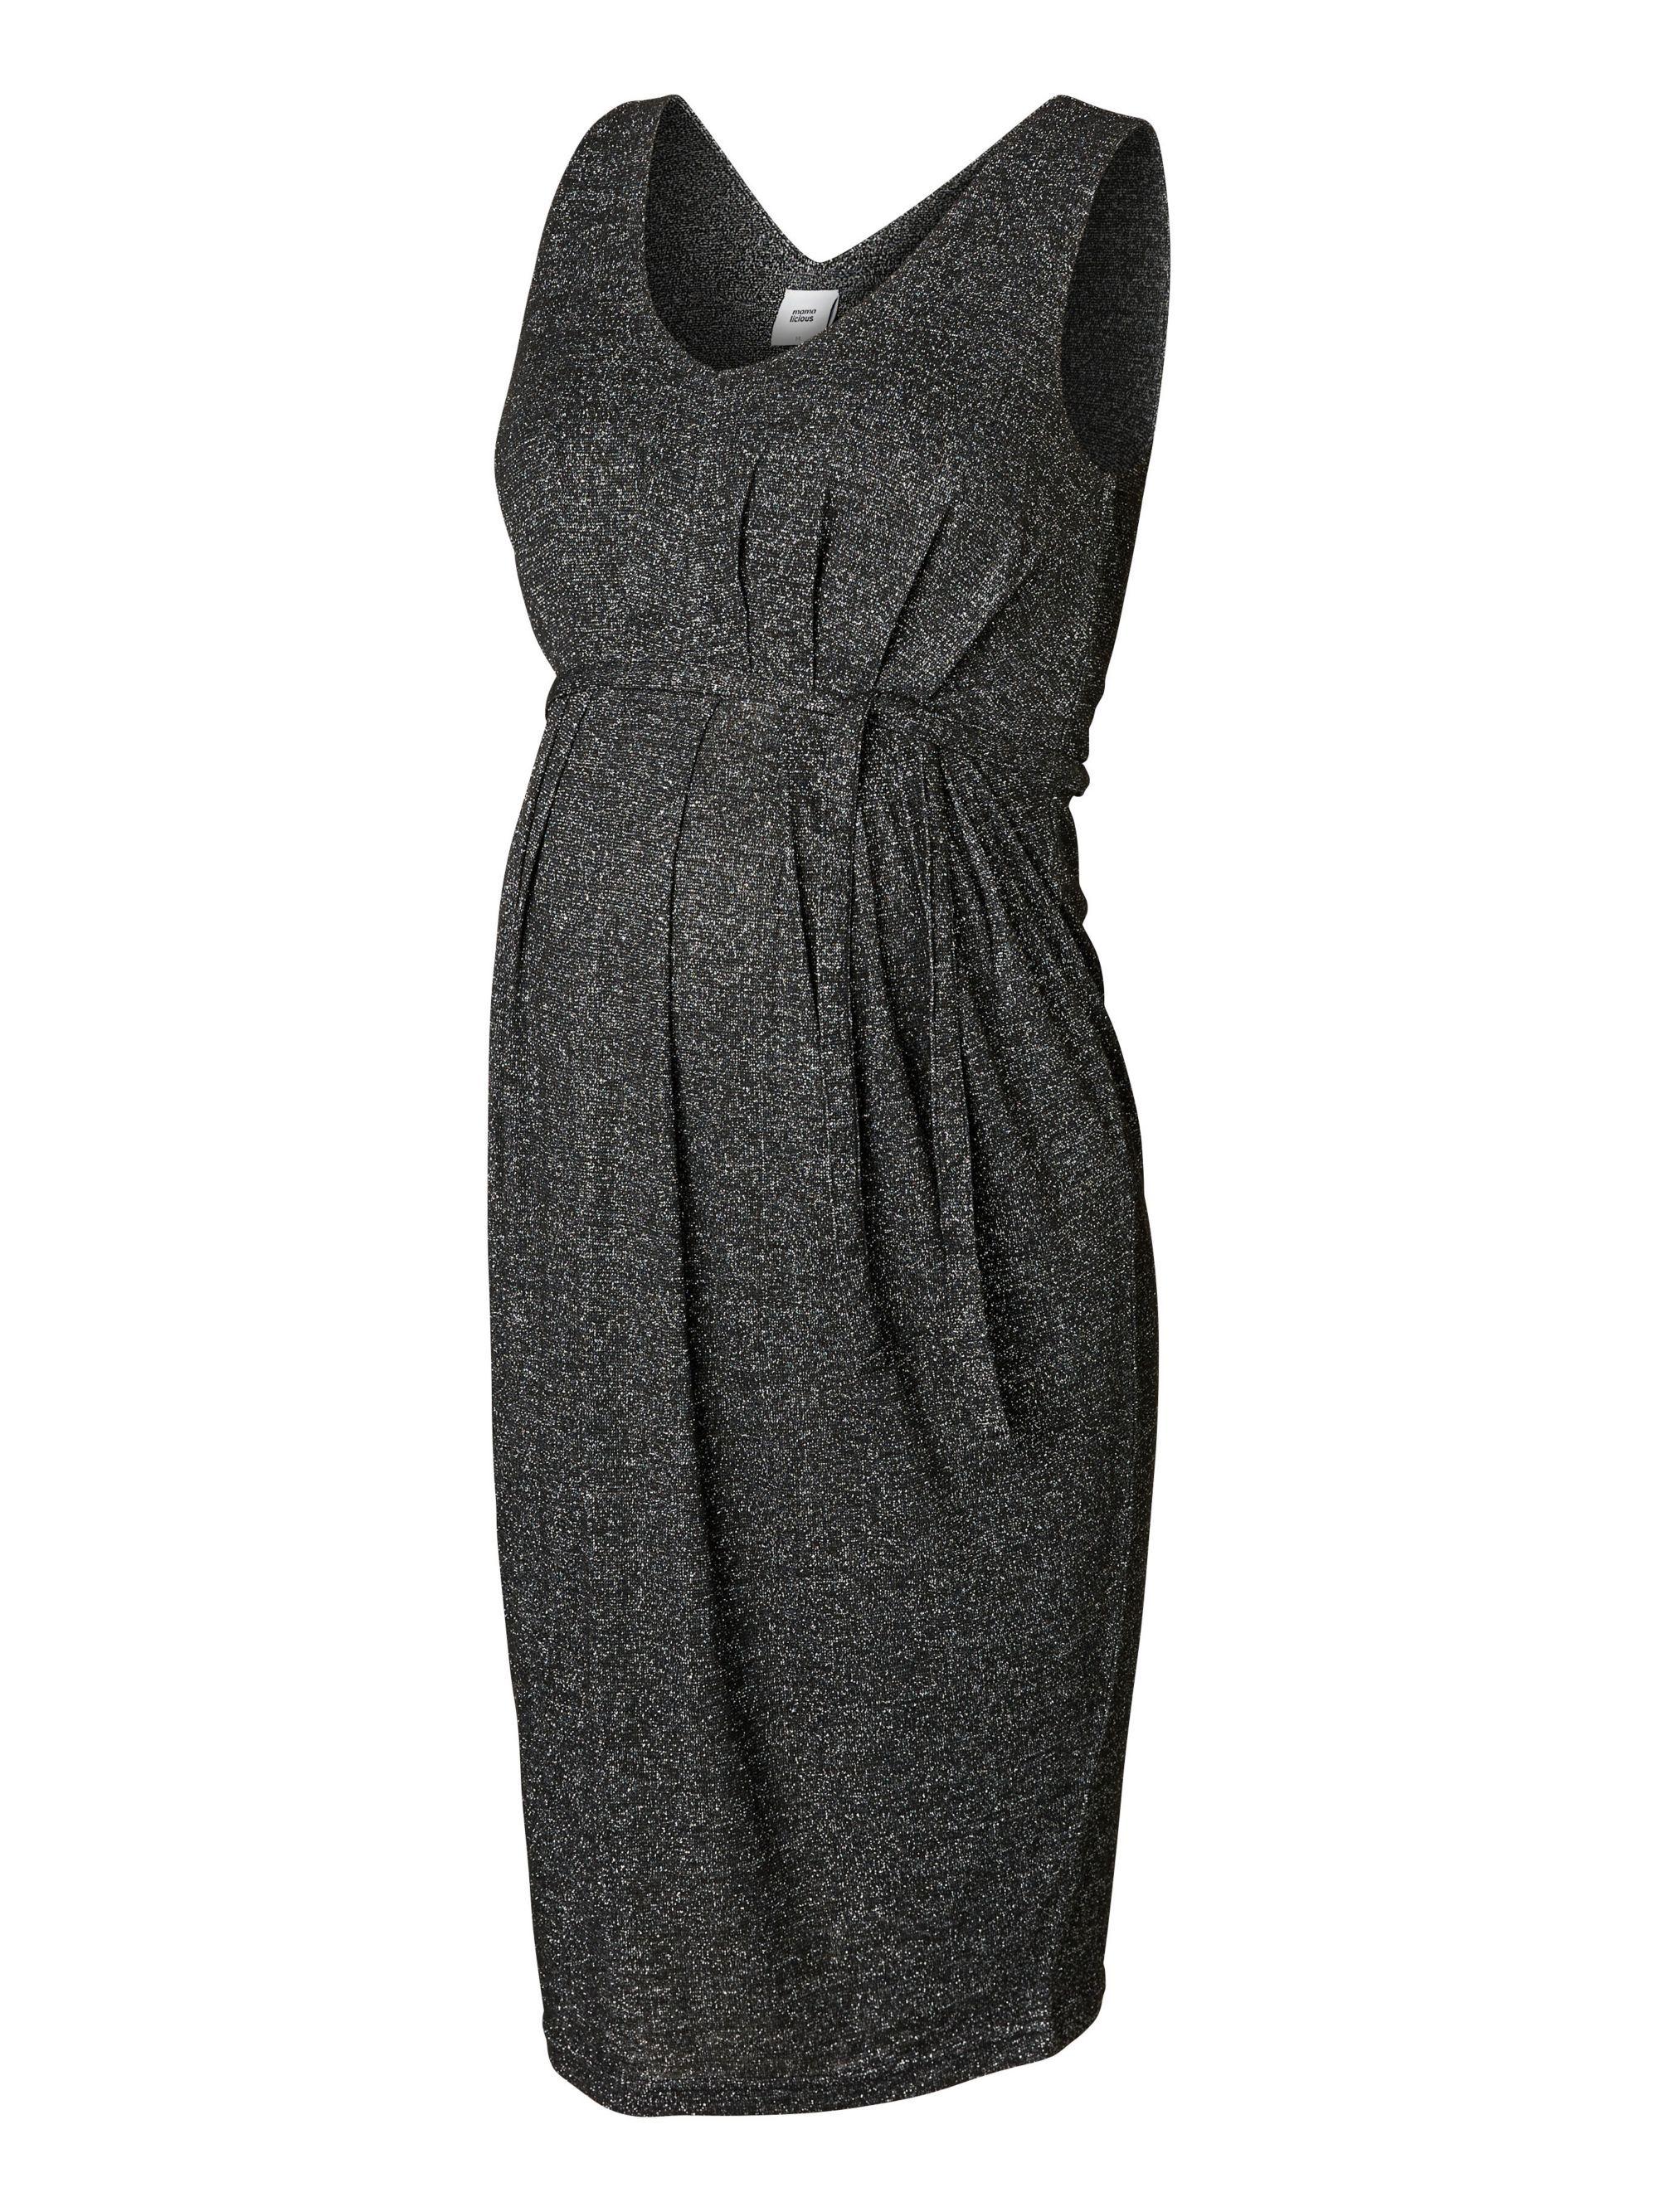 e9a1e79a72e62 Mamalicious Black Sparkle Dress | Baby / Maternity | Black sparkle ...